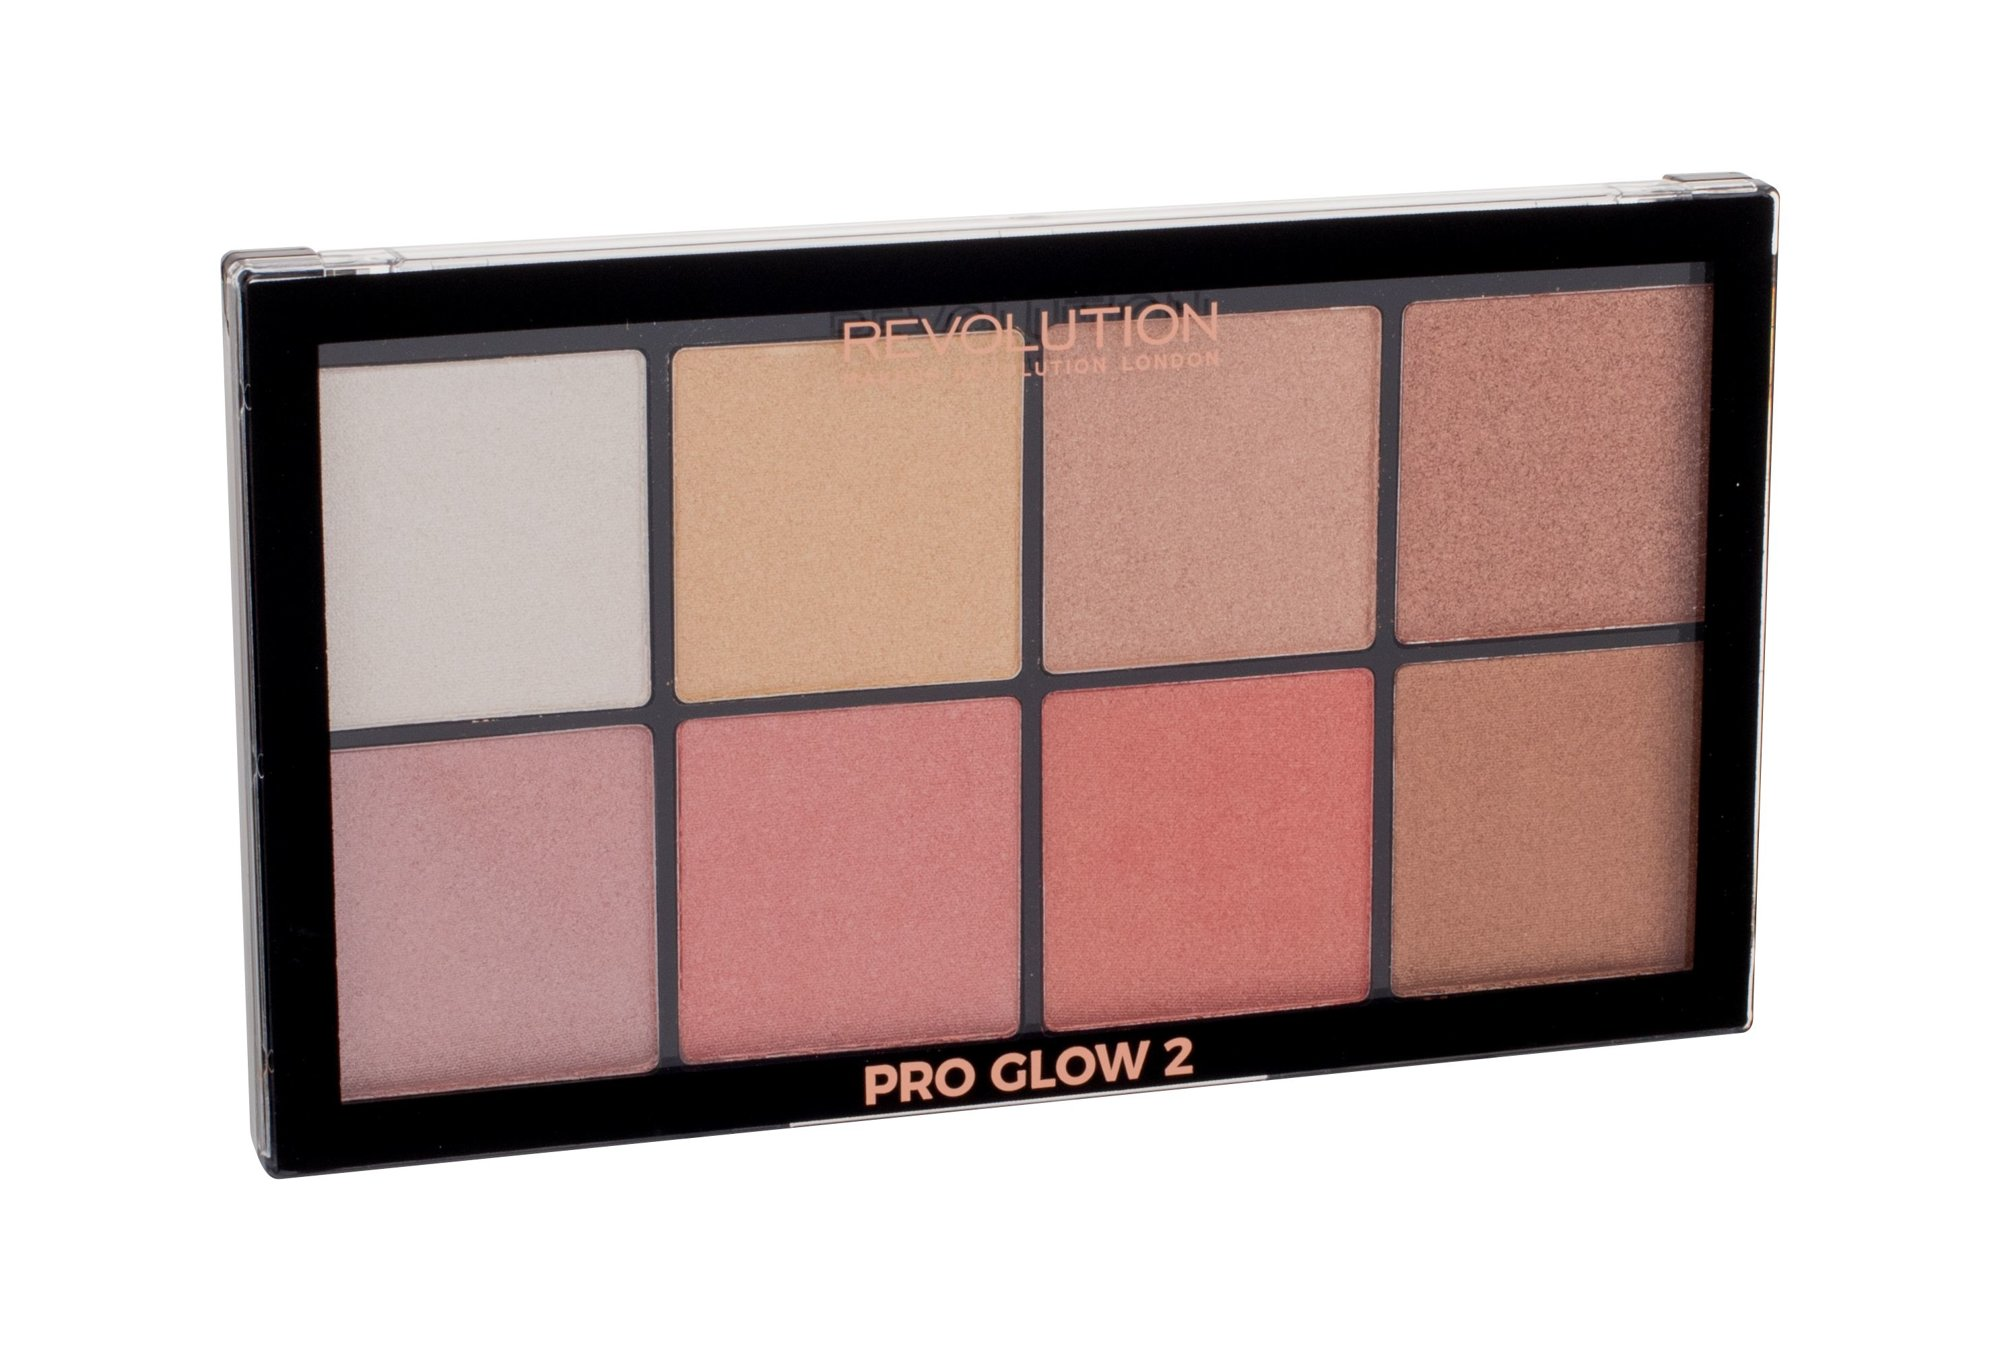 Makeup Revolution London Ultra Pro Glow Palette 2 Cosmetic 20g